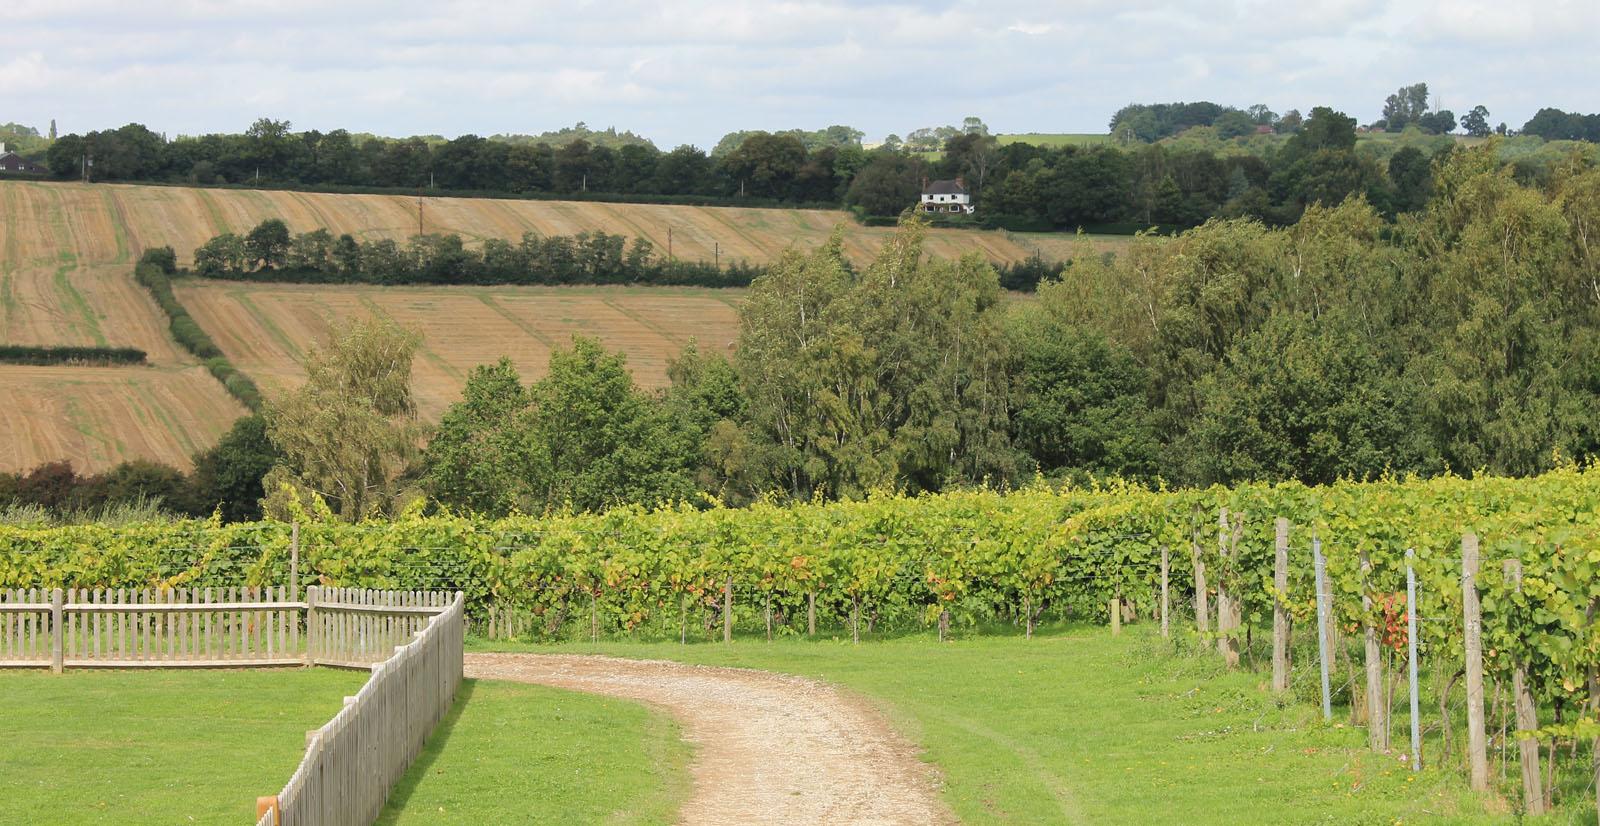 Lamberhurst vineyards